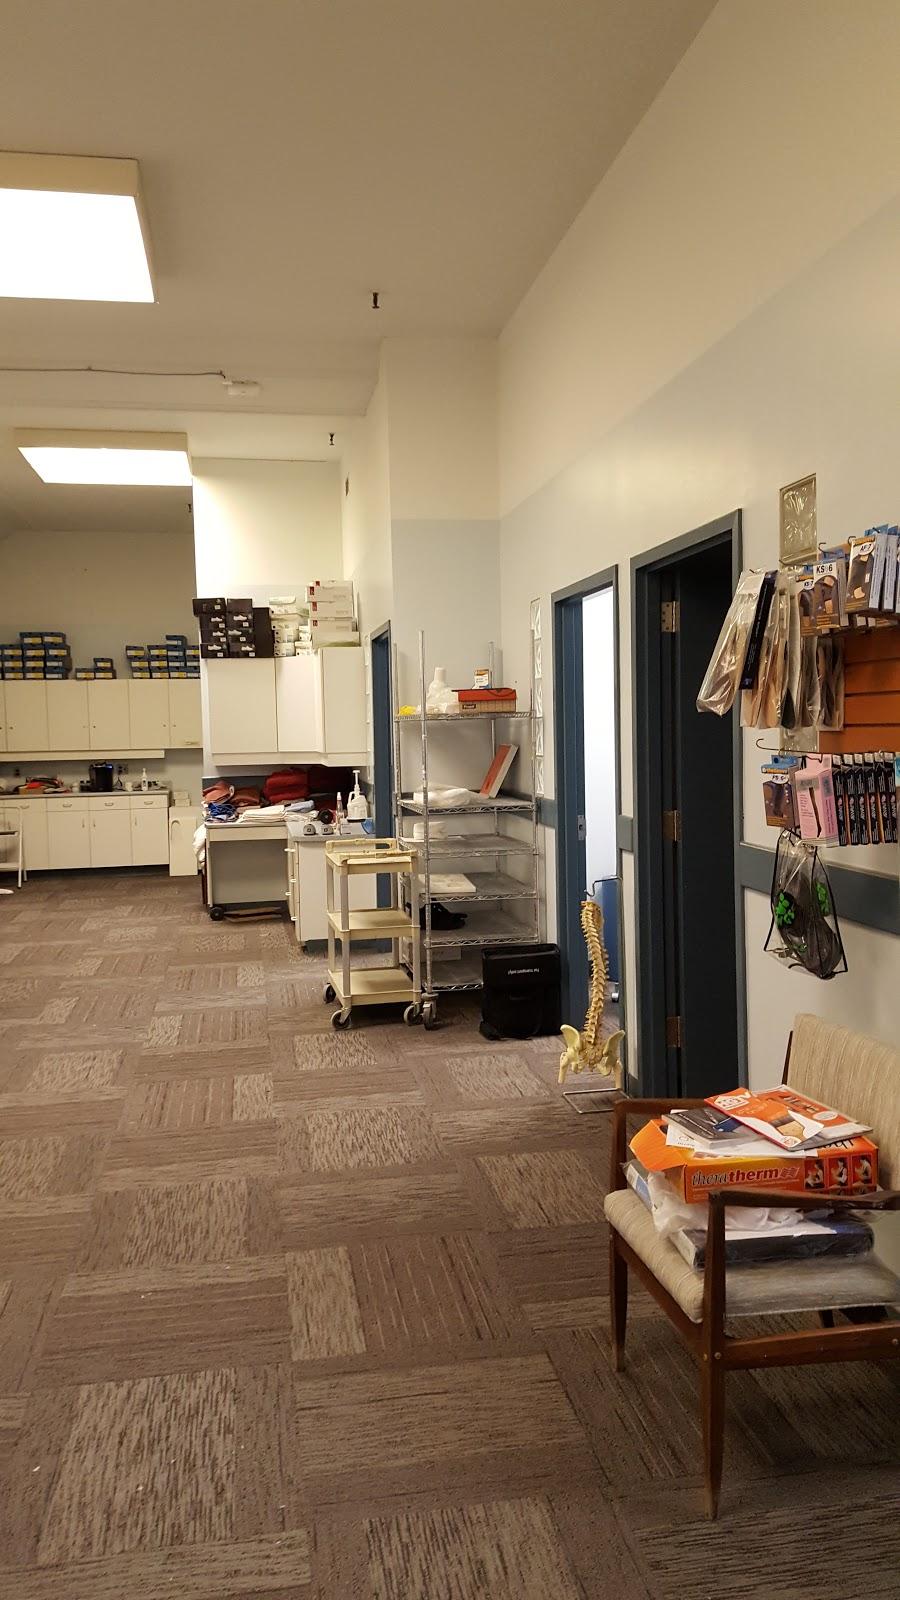 Prothotics Healthwest | health | 4th Floor - The Bay Downtown, 450 Portage Ave, Winnipeg, MB R3C 0E7, Canada | 2047833355 OR +1 204-783-3355